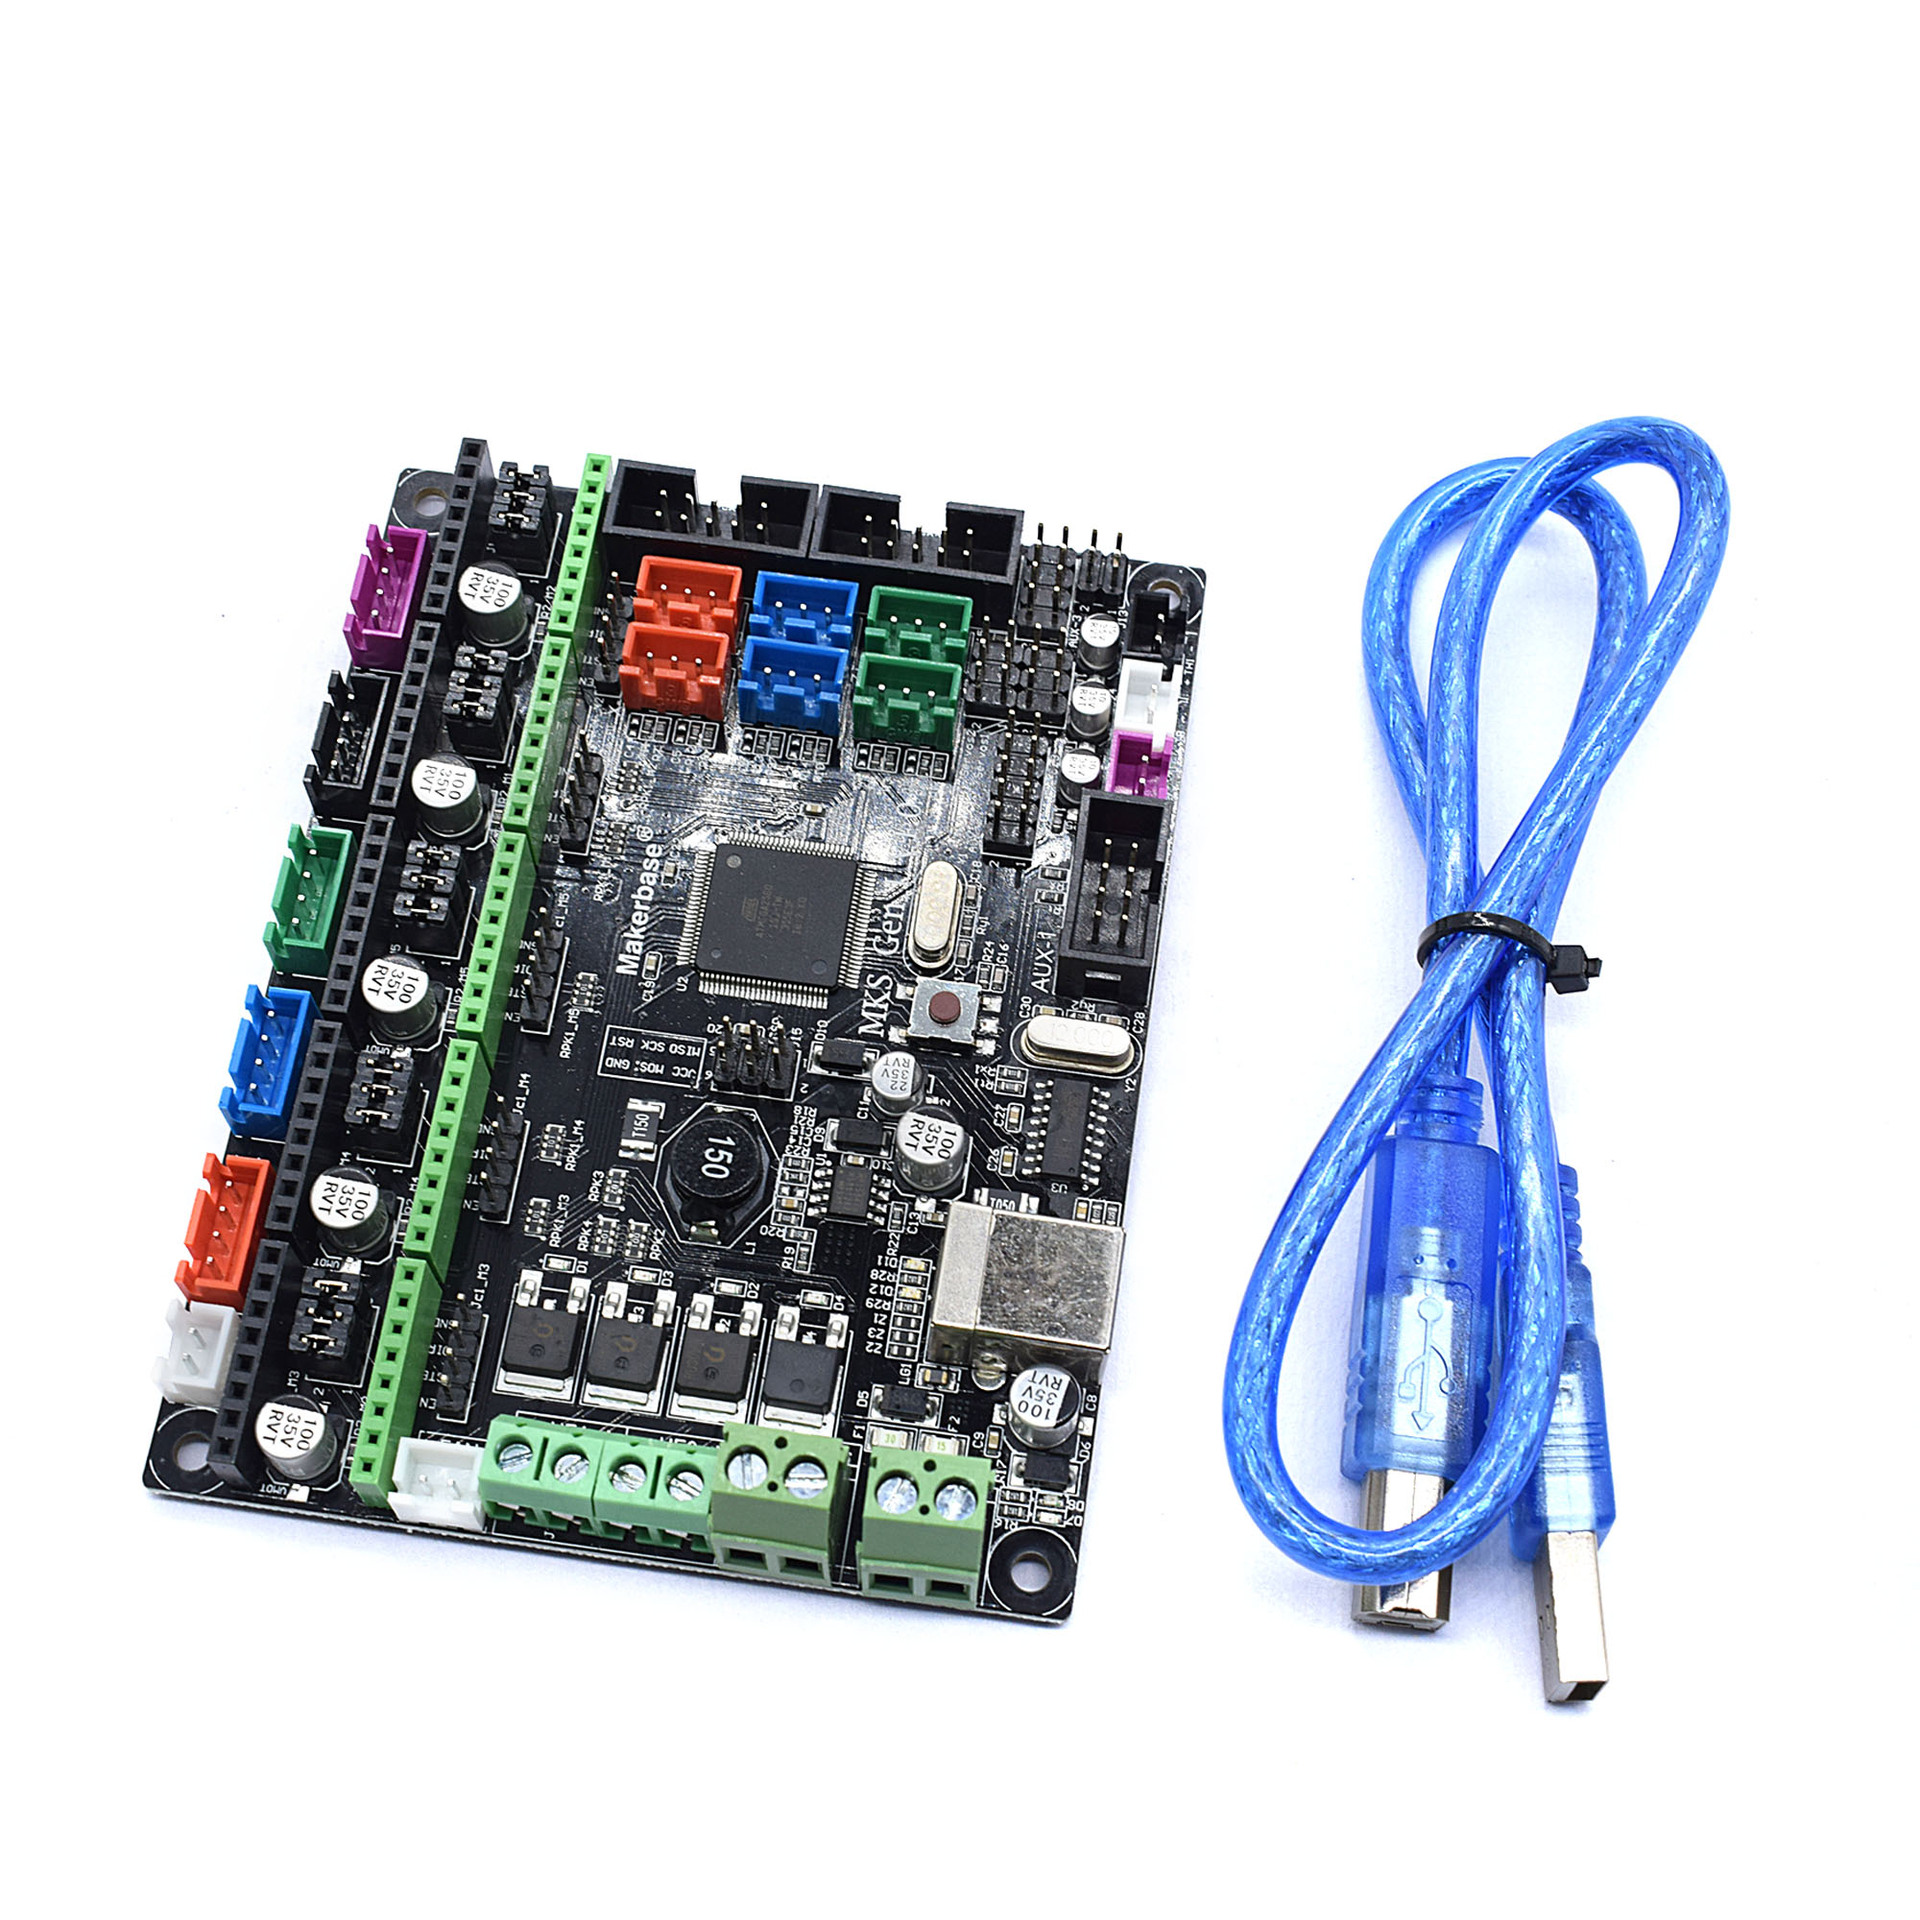 MKS Gen L V1.0 controller board integrated mainboard compatible Ramps1.4/Mega2560 R3 DRV8825/TMC2100 for tevo 3d printer parts mks gen l v1 0 integrated mainboard mks gen l v1 0 compatible ramps1 4 mega2560 r3 with 5pcs tmc2100 v1 3 stepper drivers